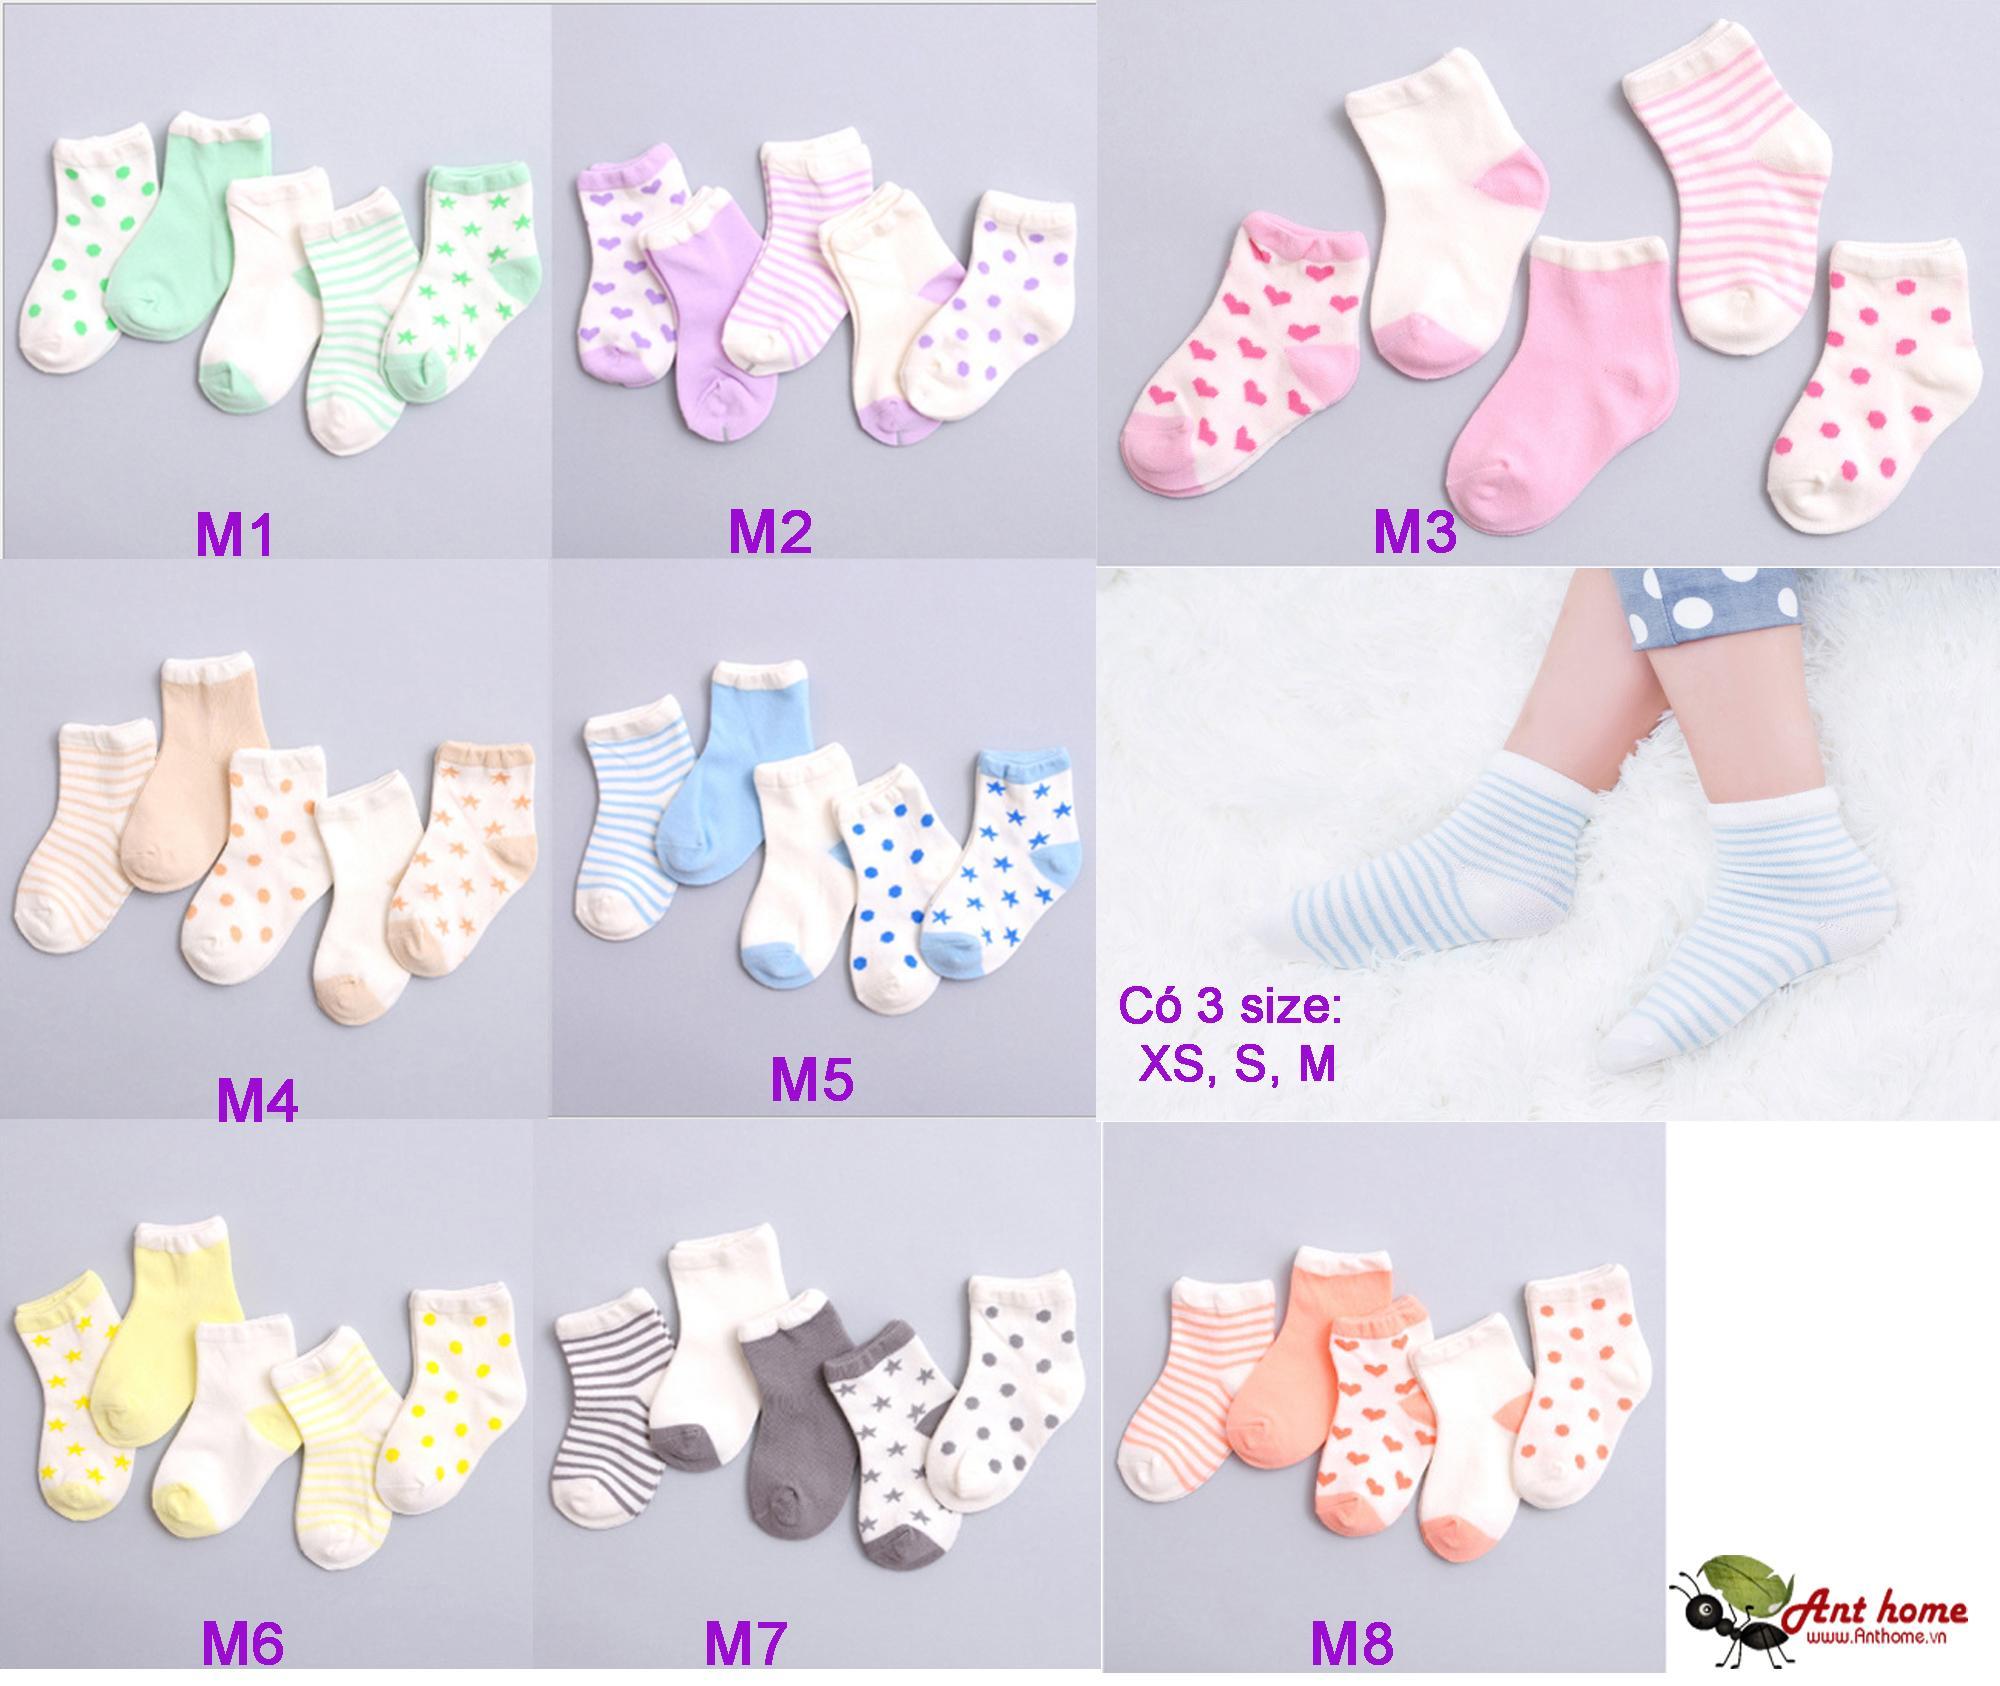 Combo 5 đôi vớ (tất) bé gái từ 0-1 tuổi size XS mẫu M3